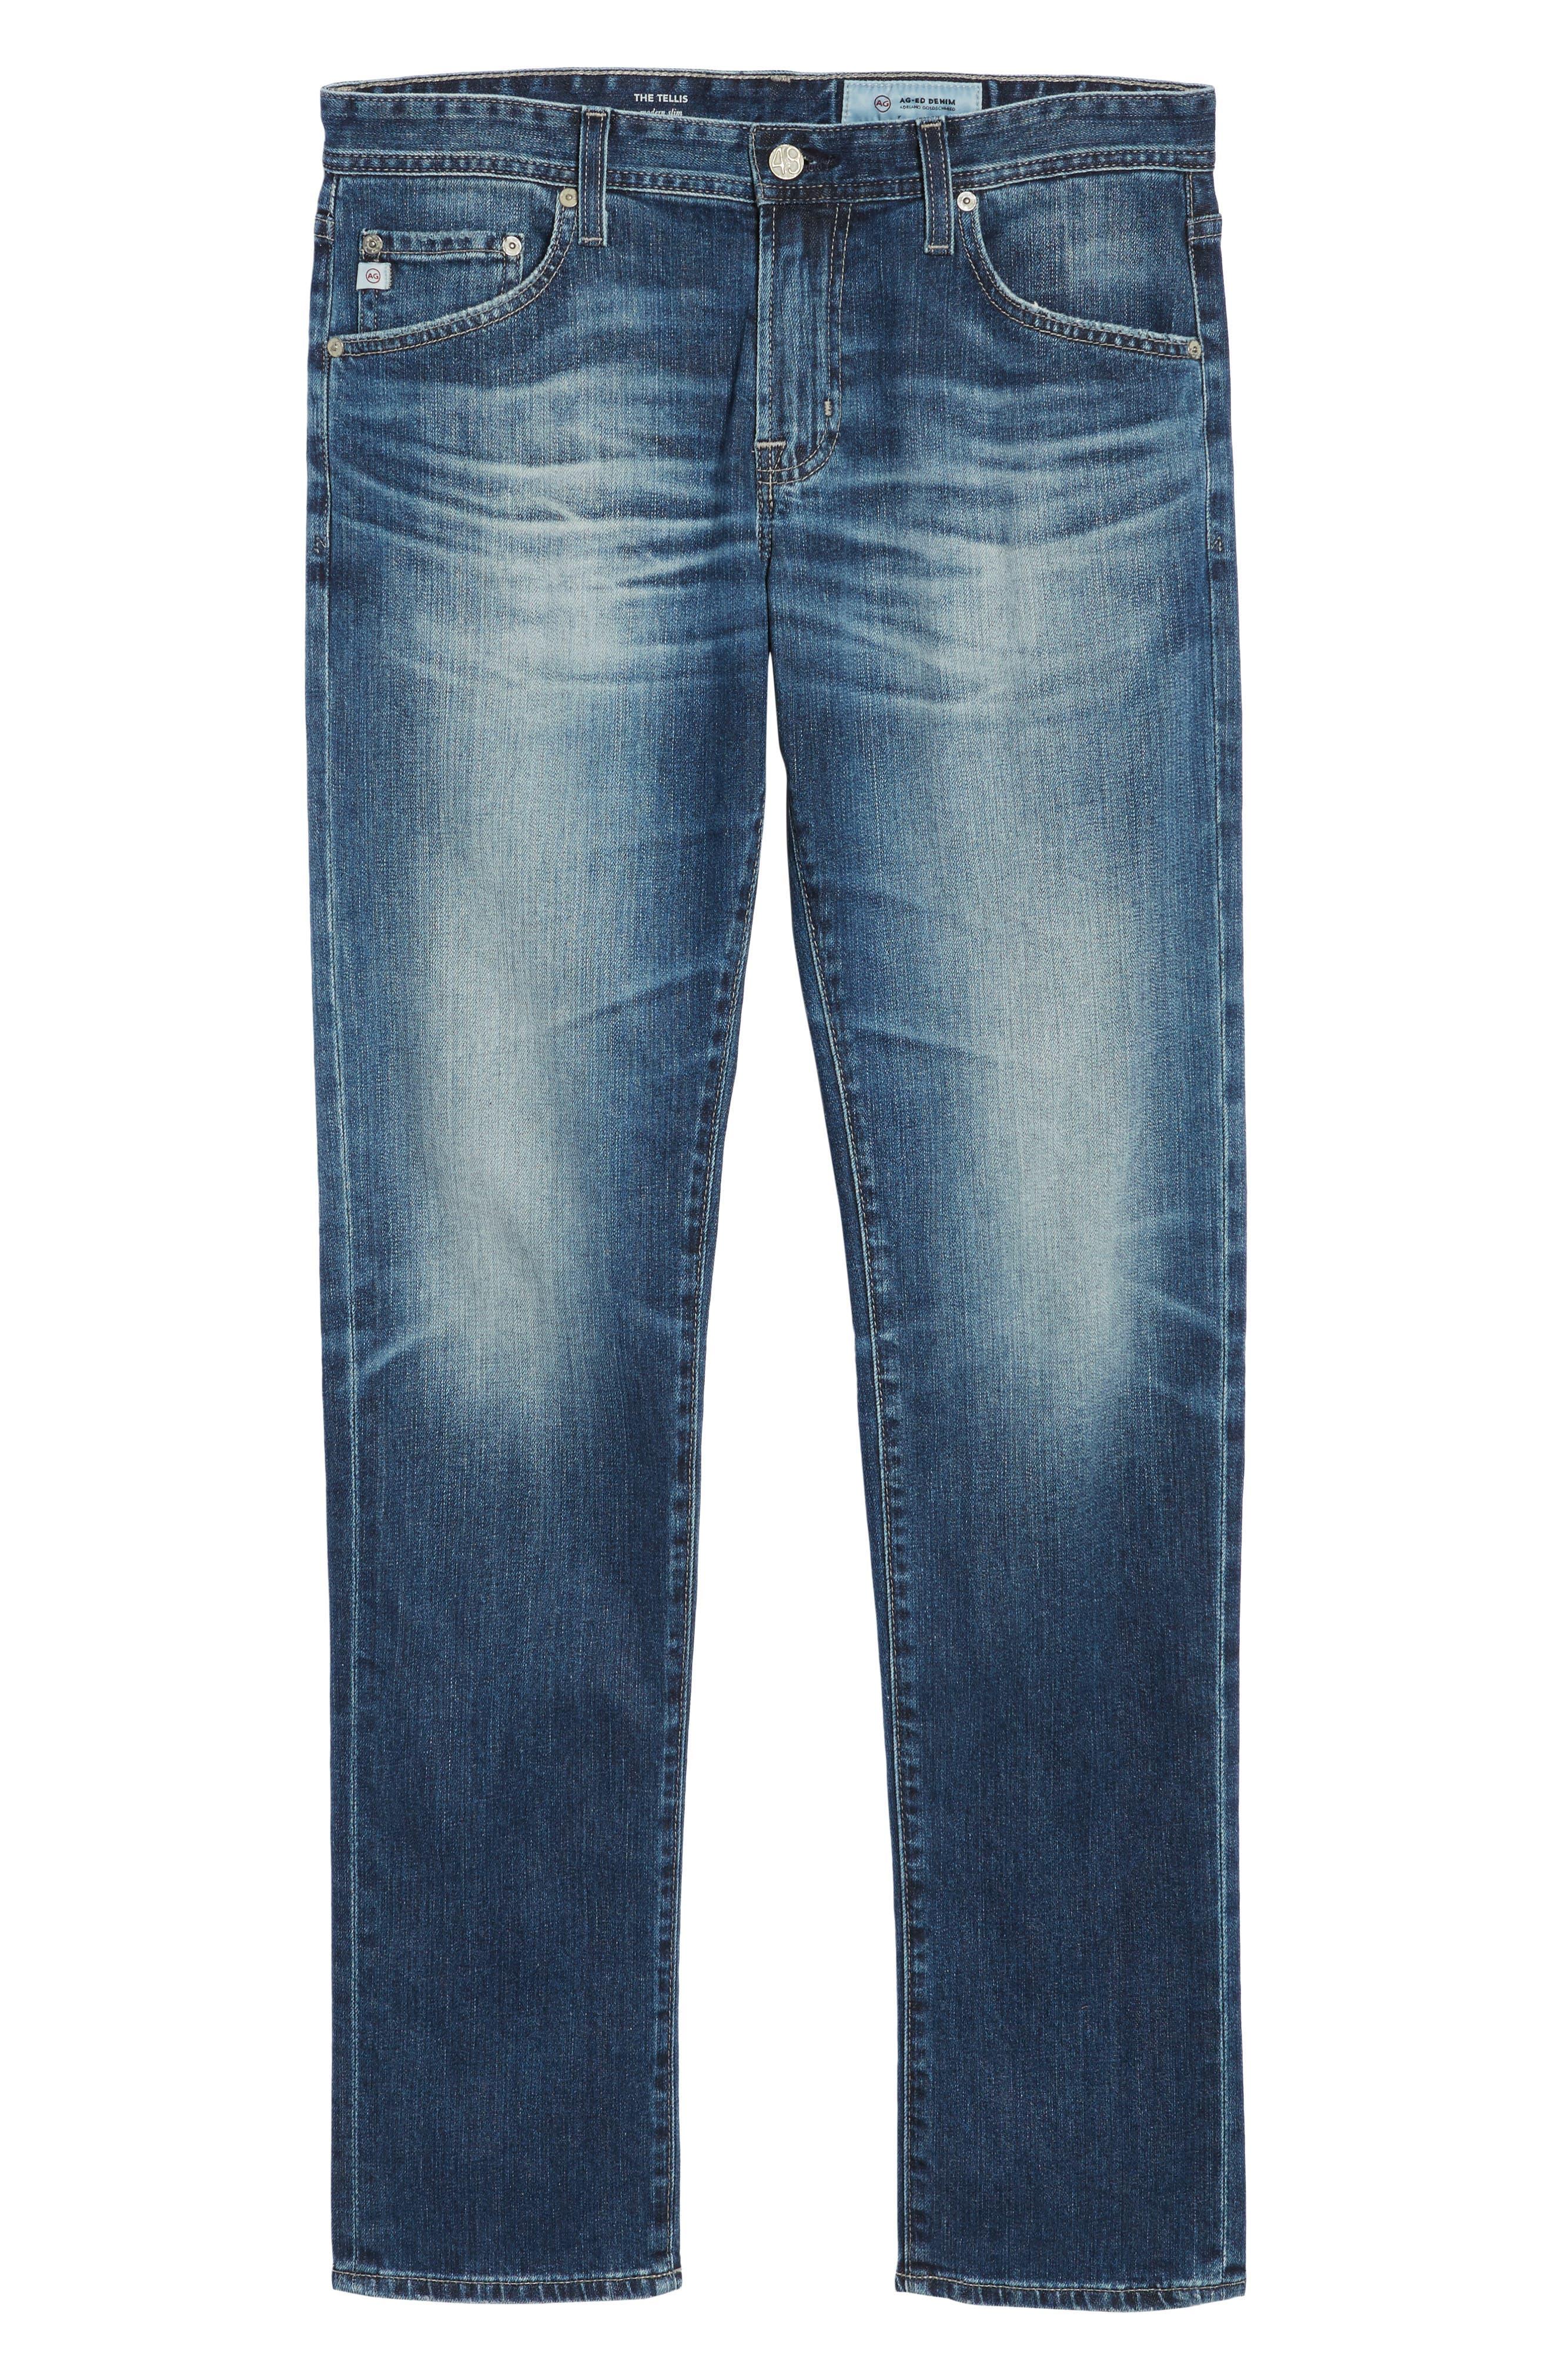 Tellis Slim Fit Jeans,                             Alternate thumbnail 6, color,                             12 YEARS MAVERICKS